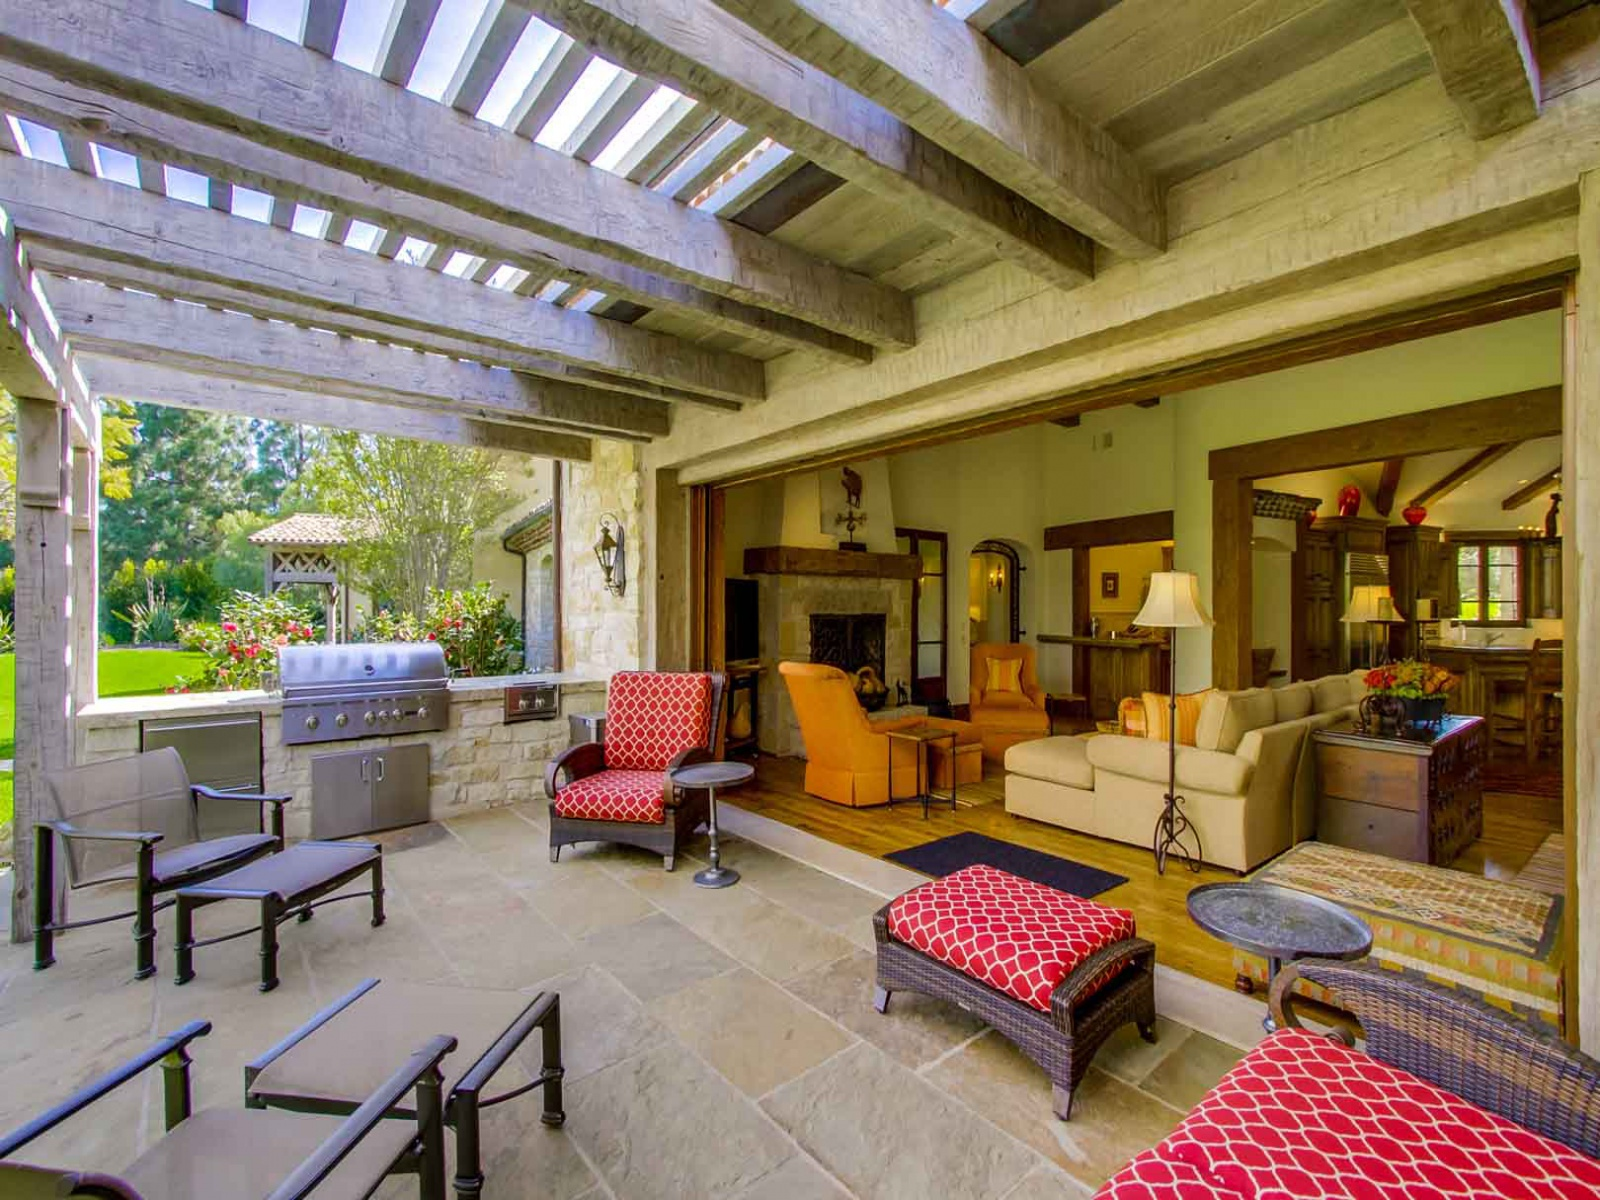 6560 La Valle Plateada,Rancho Santa Fe,California 92067,House,La Valle Plateada,1008